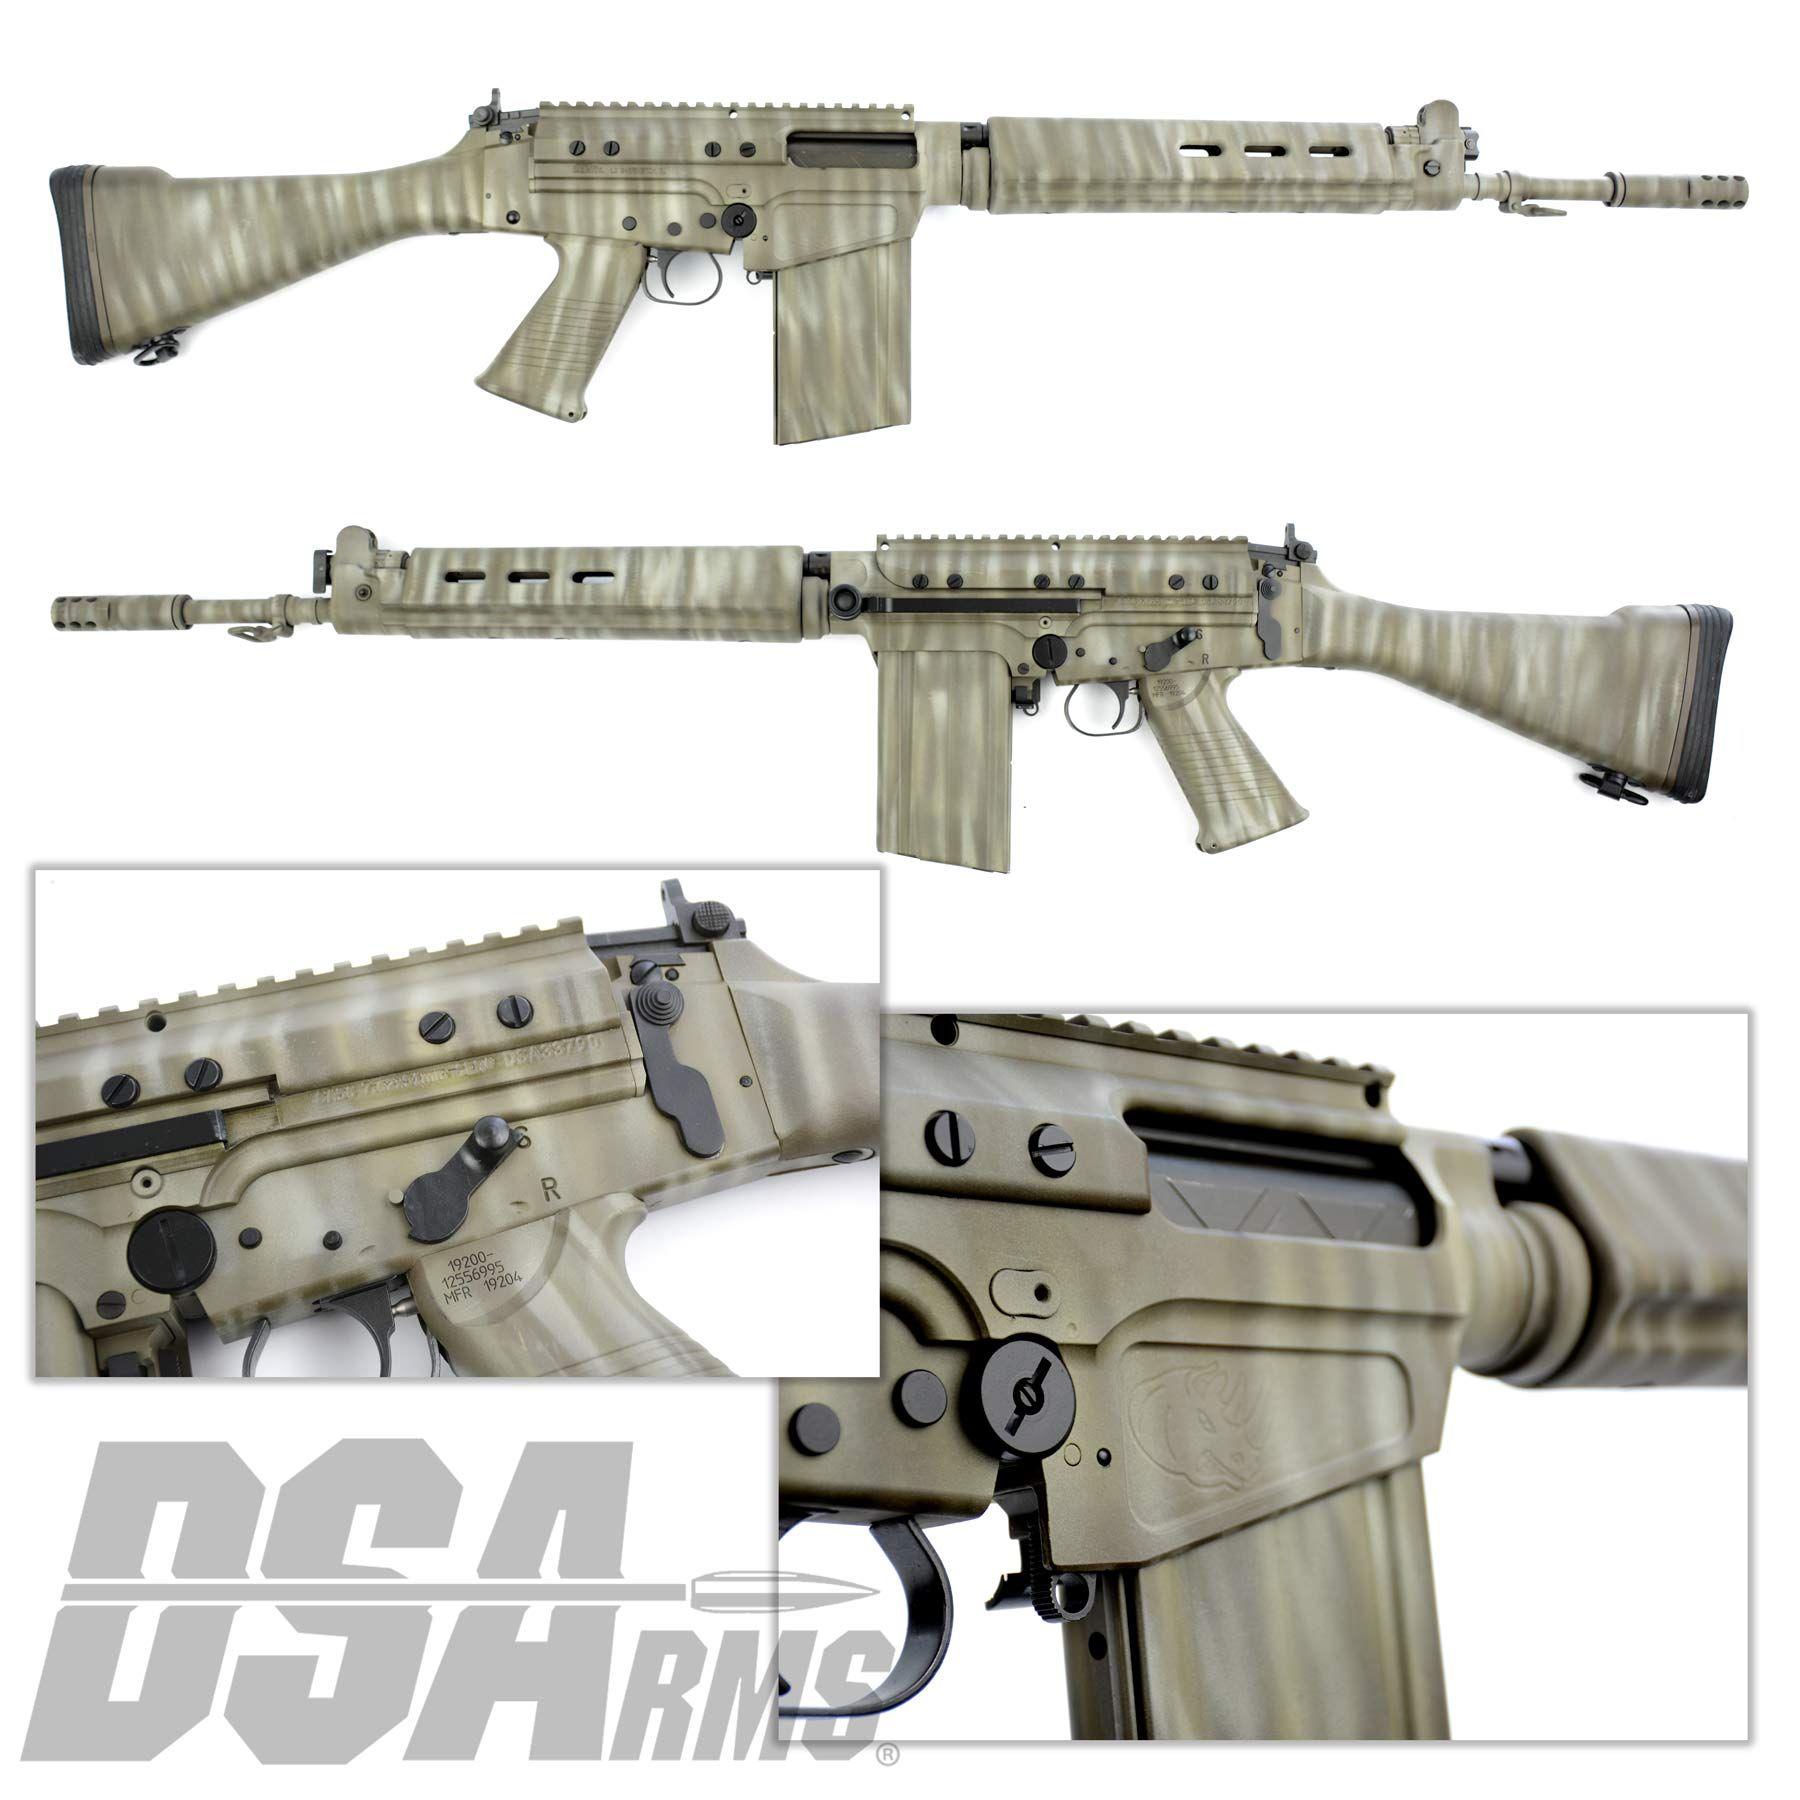 1354ede14ce DSArms Custom Shop SA58 FAL!.  pewpewlife  dsarmsinc  dsa  sa58  fnfal  fal   gun  rifle  762x51  rhodesian  OSW  firearms  southafrica  rhino